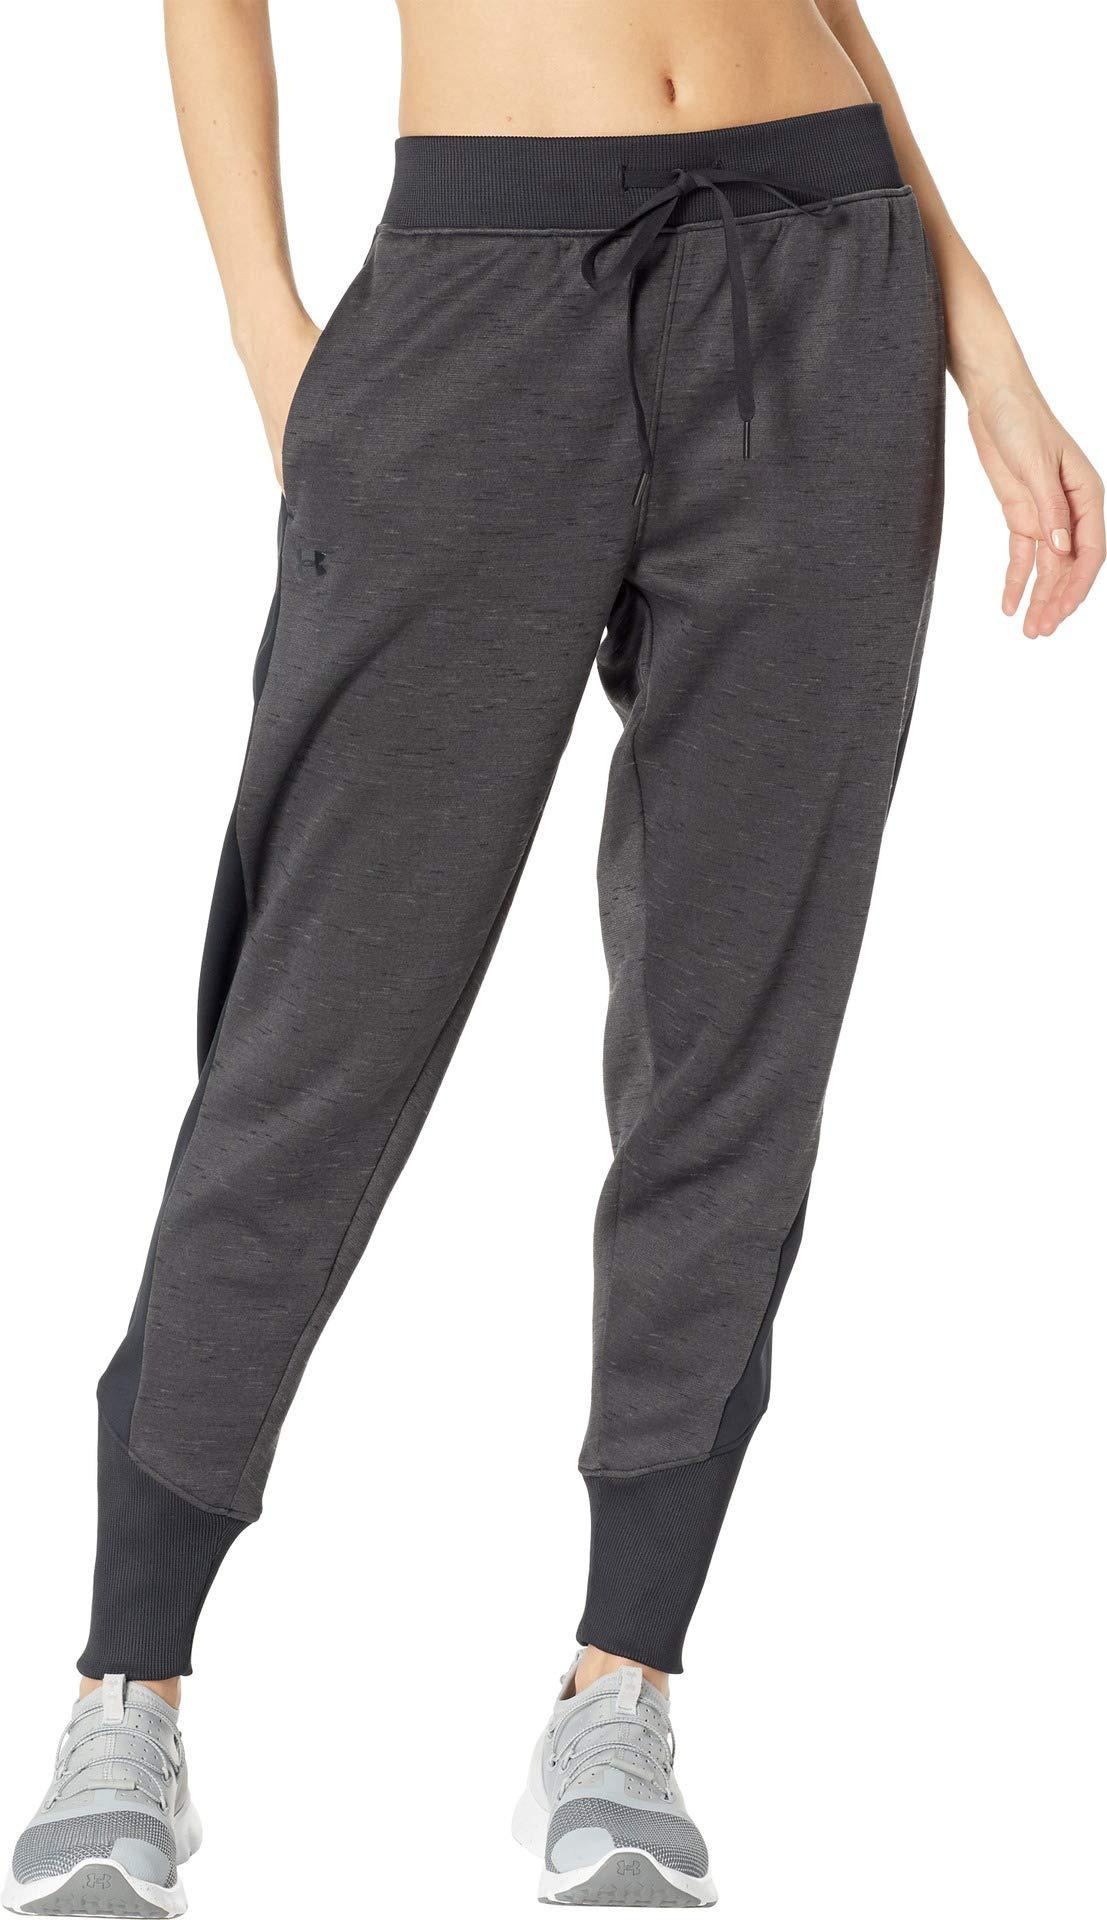 Under Armour Women's Synthetic Fleece Jogger Pants Black/Charcoal/Tonal XX-Large 27.5